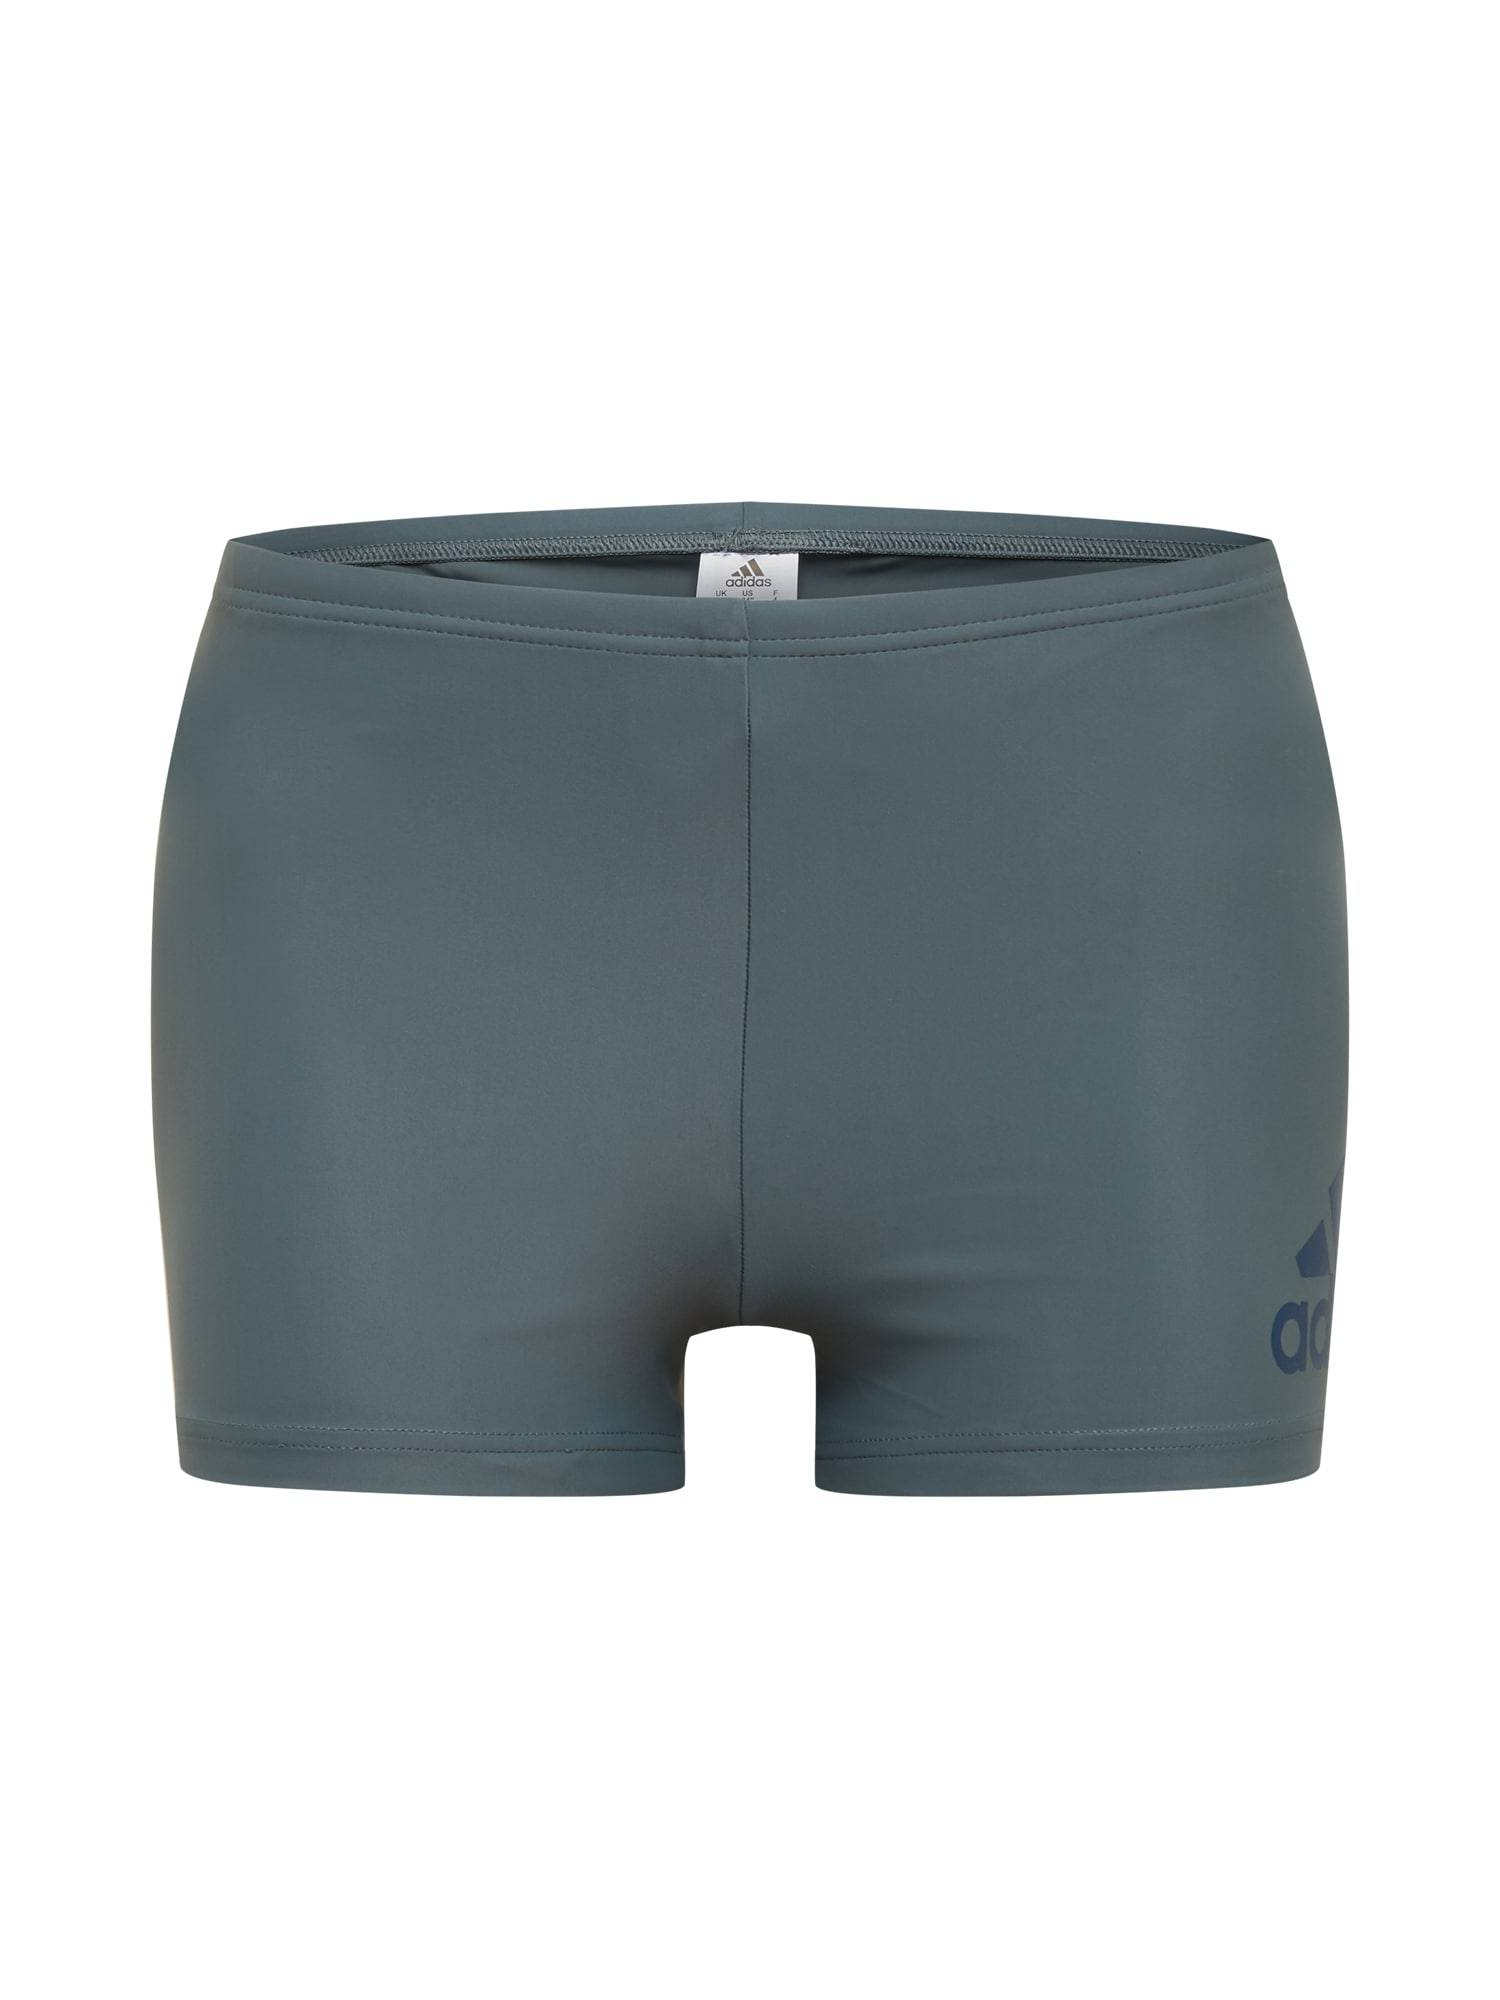 ADIDAS PERFORMANCE Maillot de bain de sport  - Bleu - Taille: 4 - male